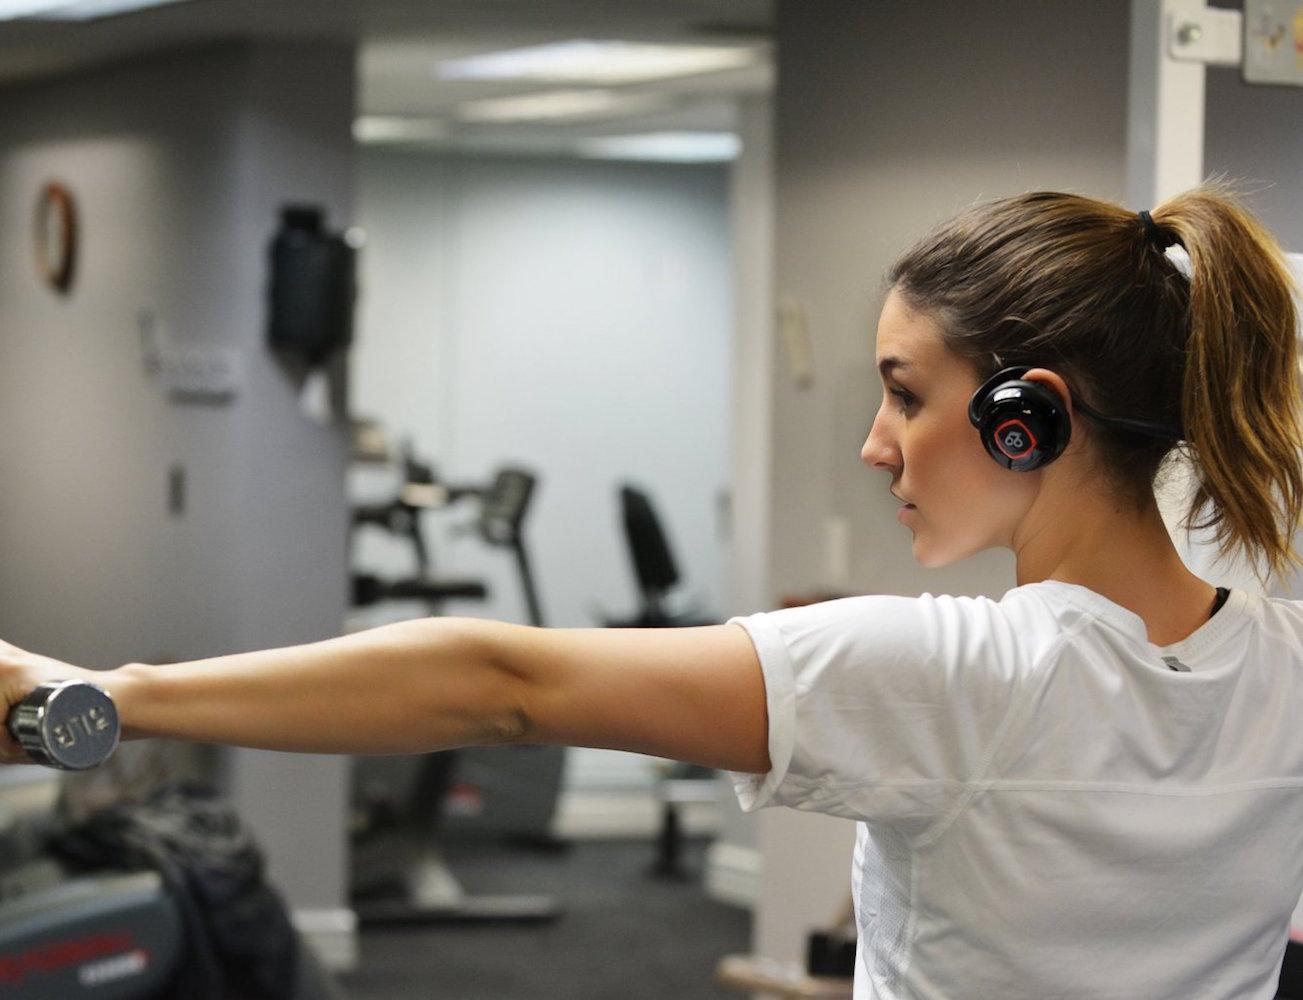 66-audio-bts-sport-bluetooth-headphones-02